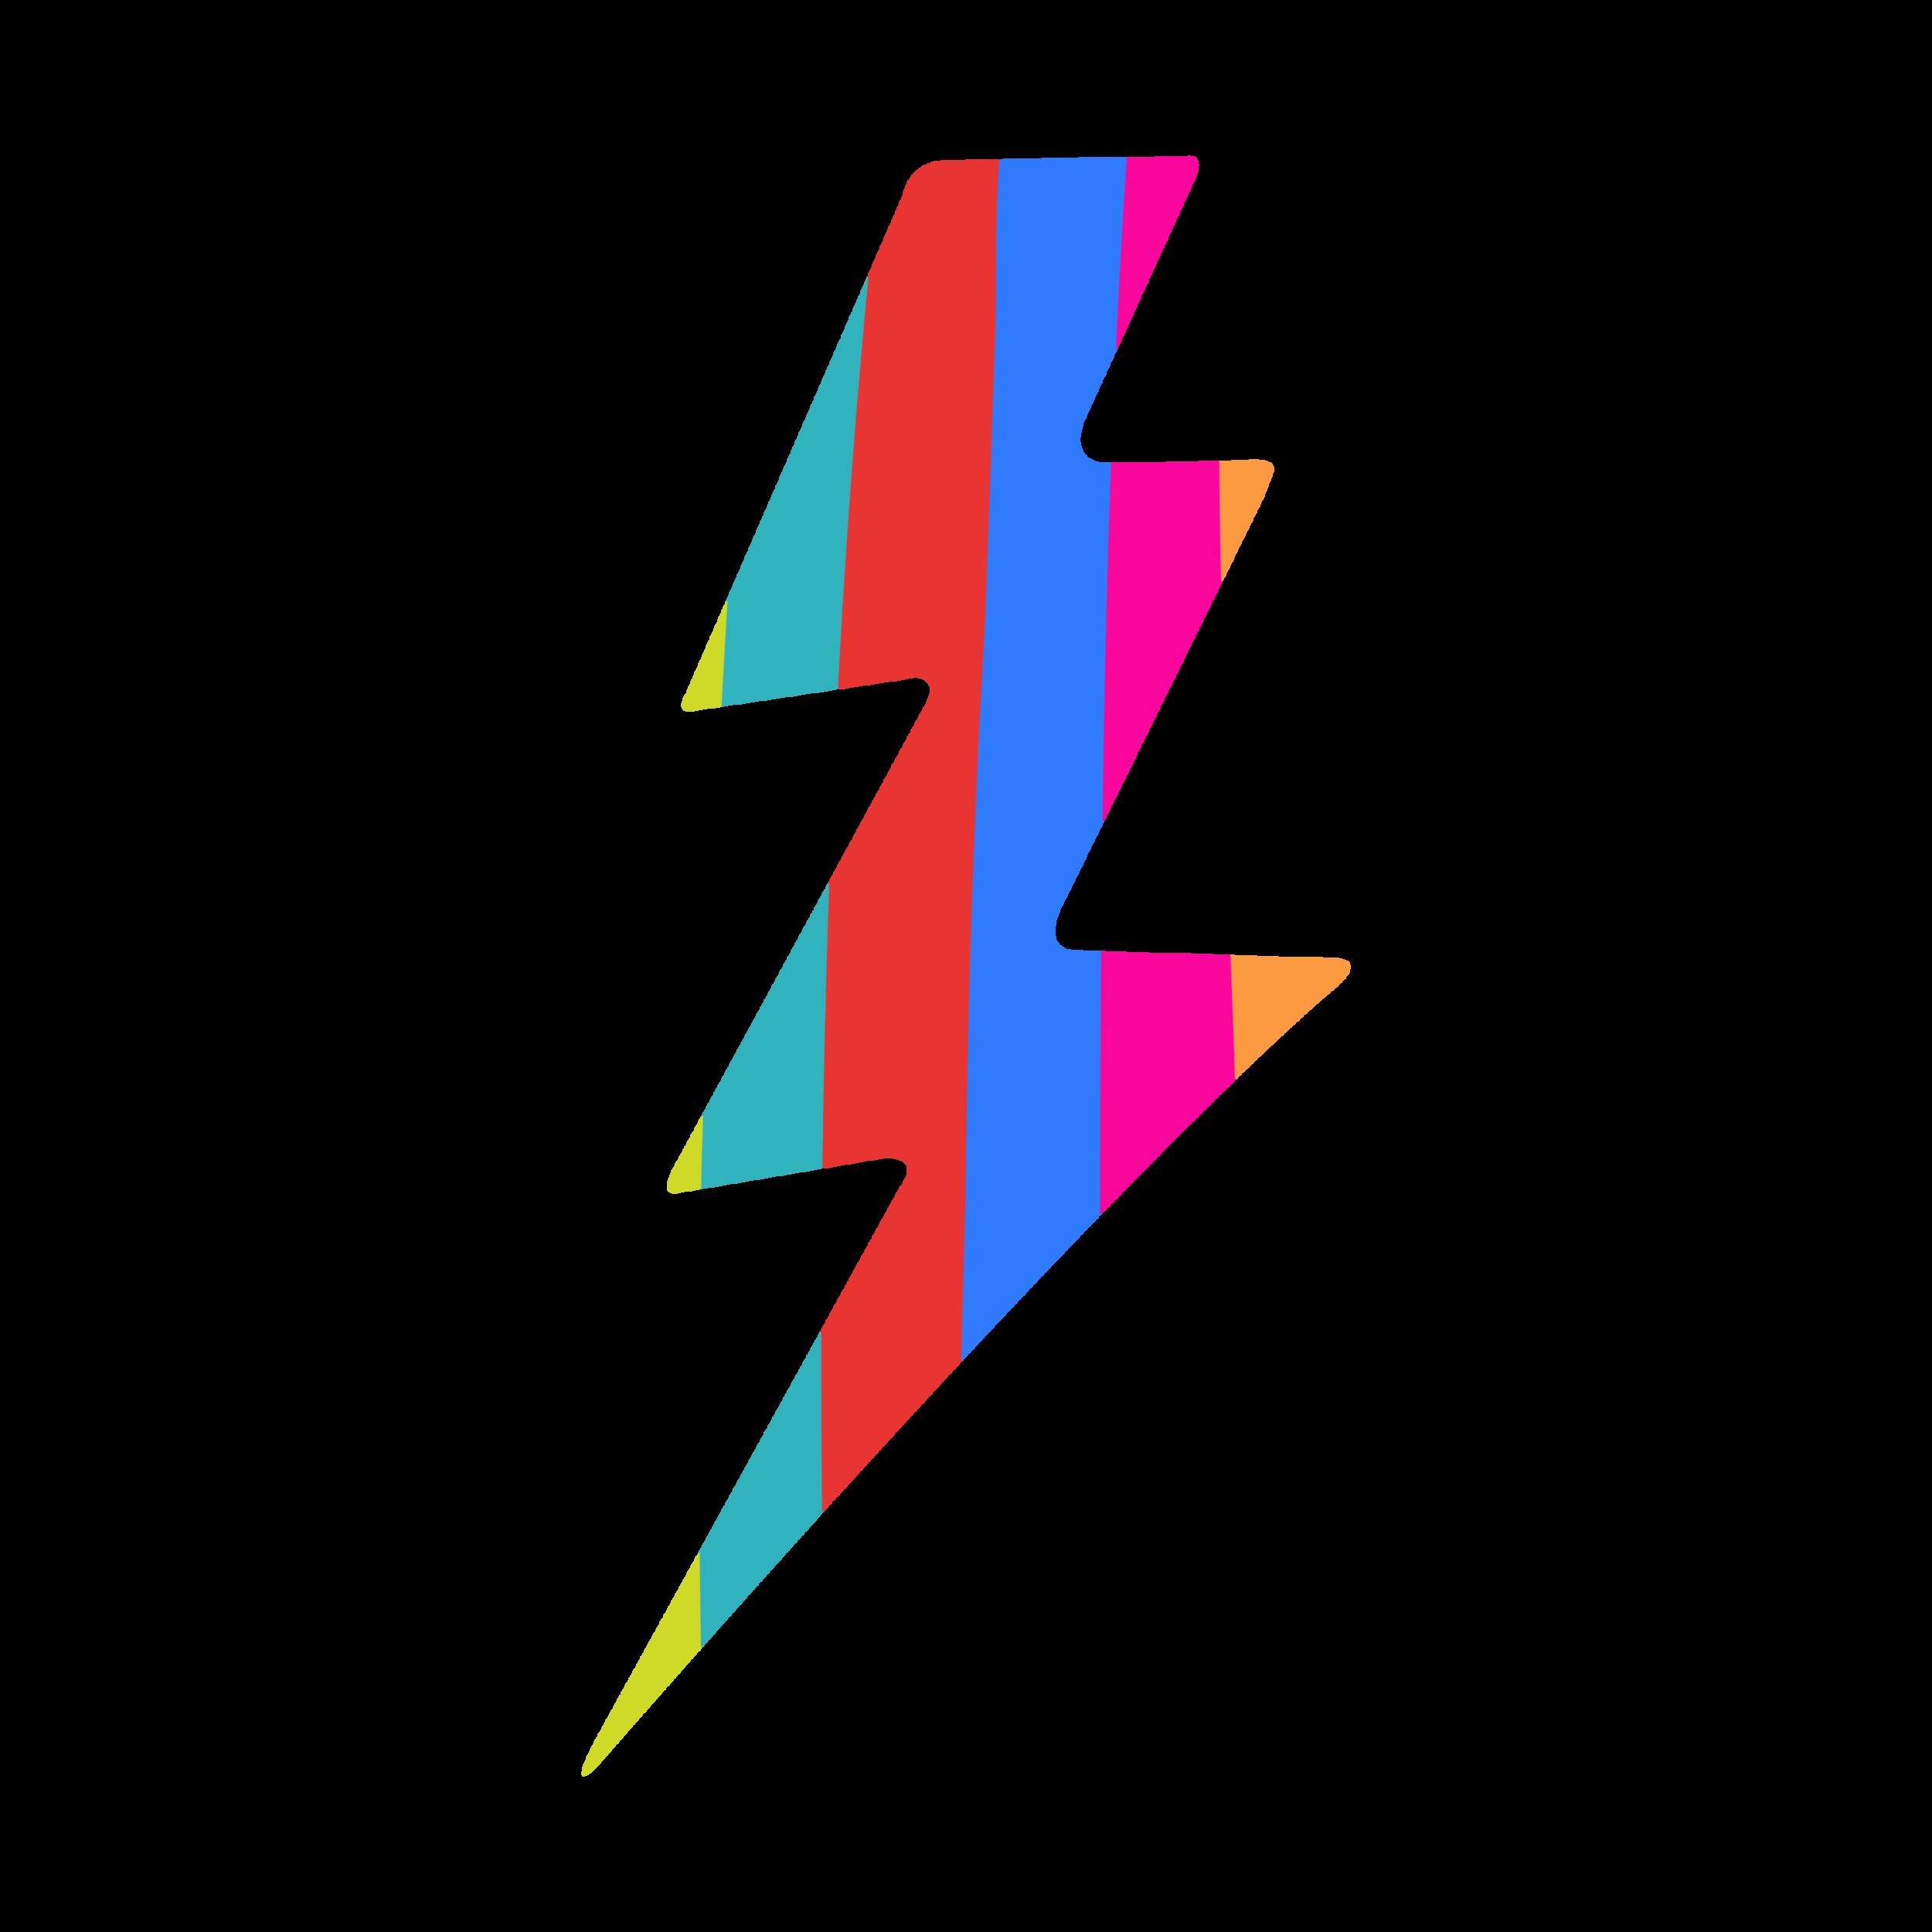 ZigZag-Rainbow-Bolt-Insignia-WB.png